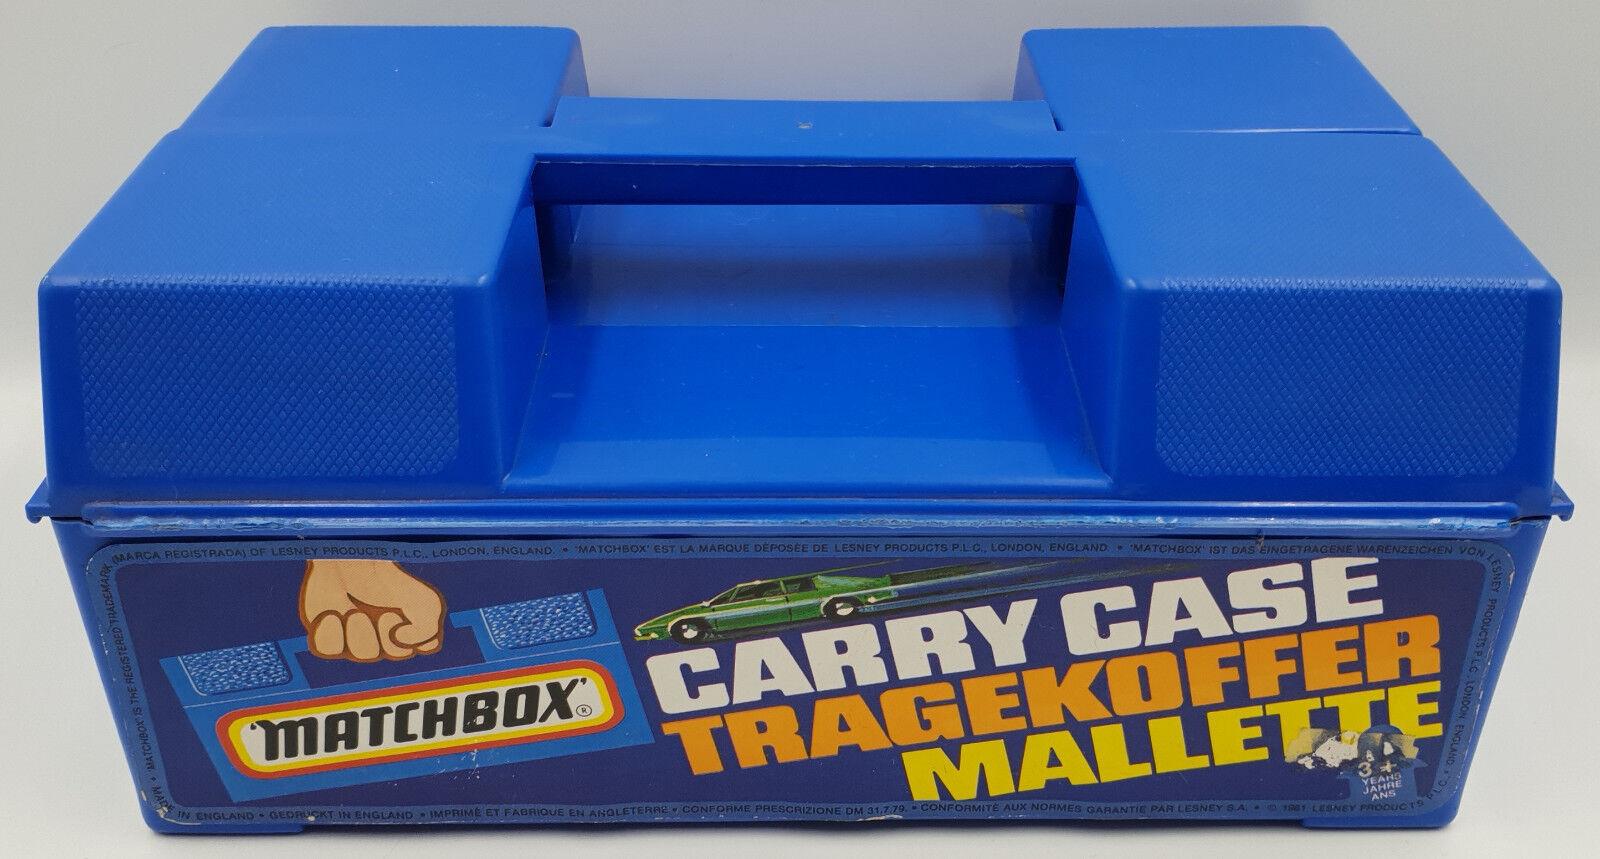 voitureS   MATCHBOX voitureRY  CASE MADE IN 1981 FOR MATCHBOX DIE voitureS MODELS (DRMP)  classique intemporel